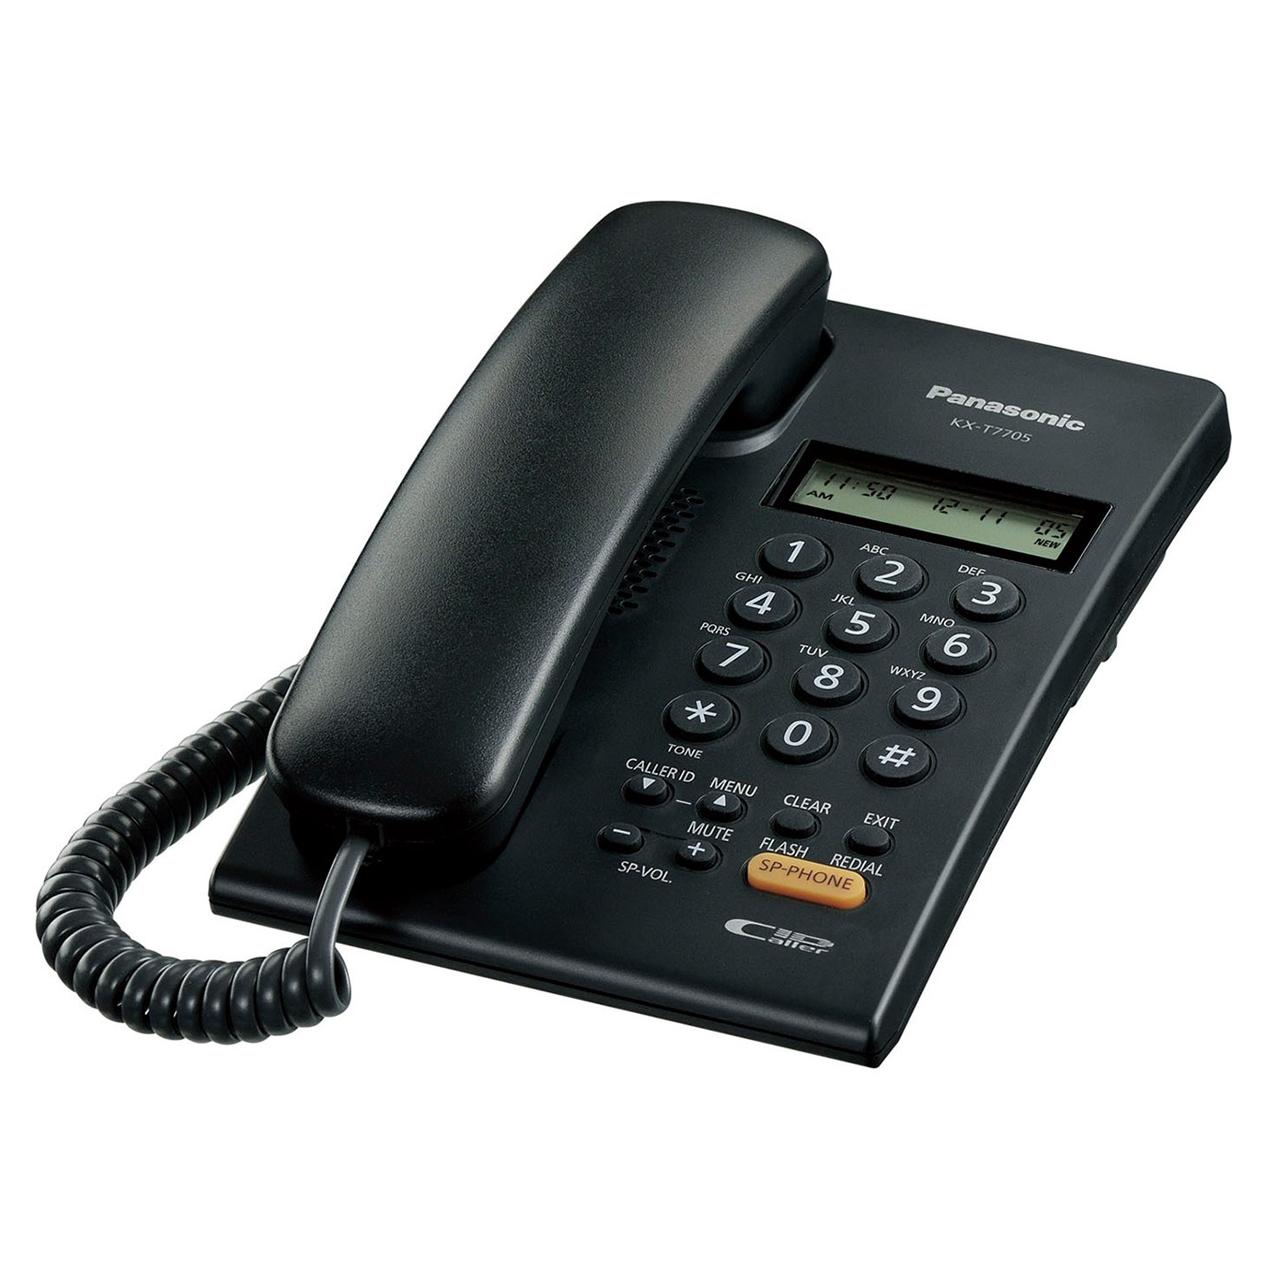 گوشی تلفن رومیزی پاناسونیک مدل KX-T7705X